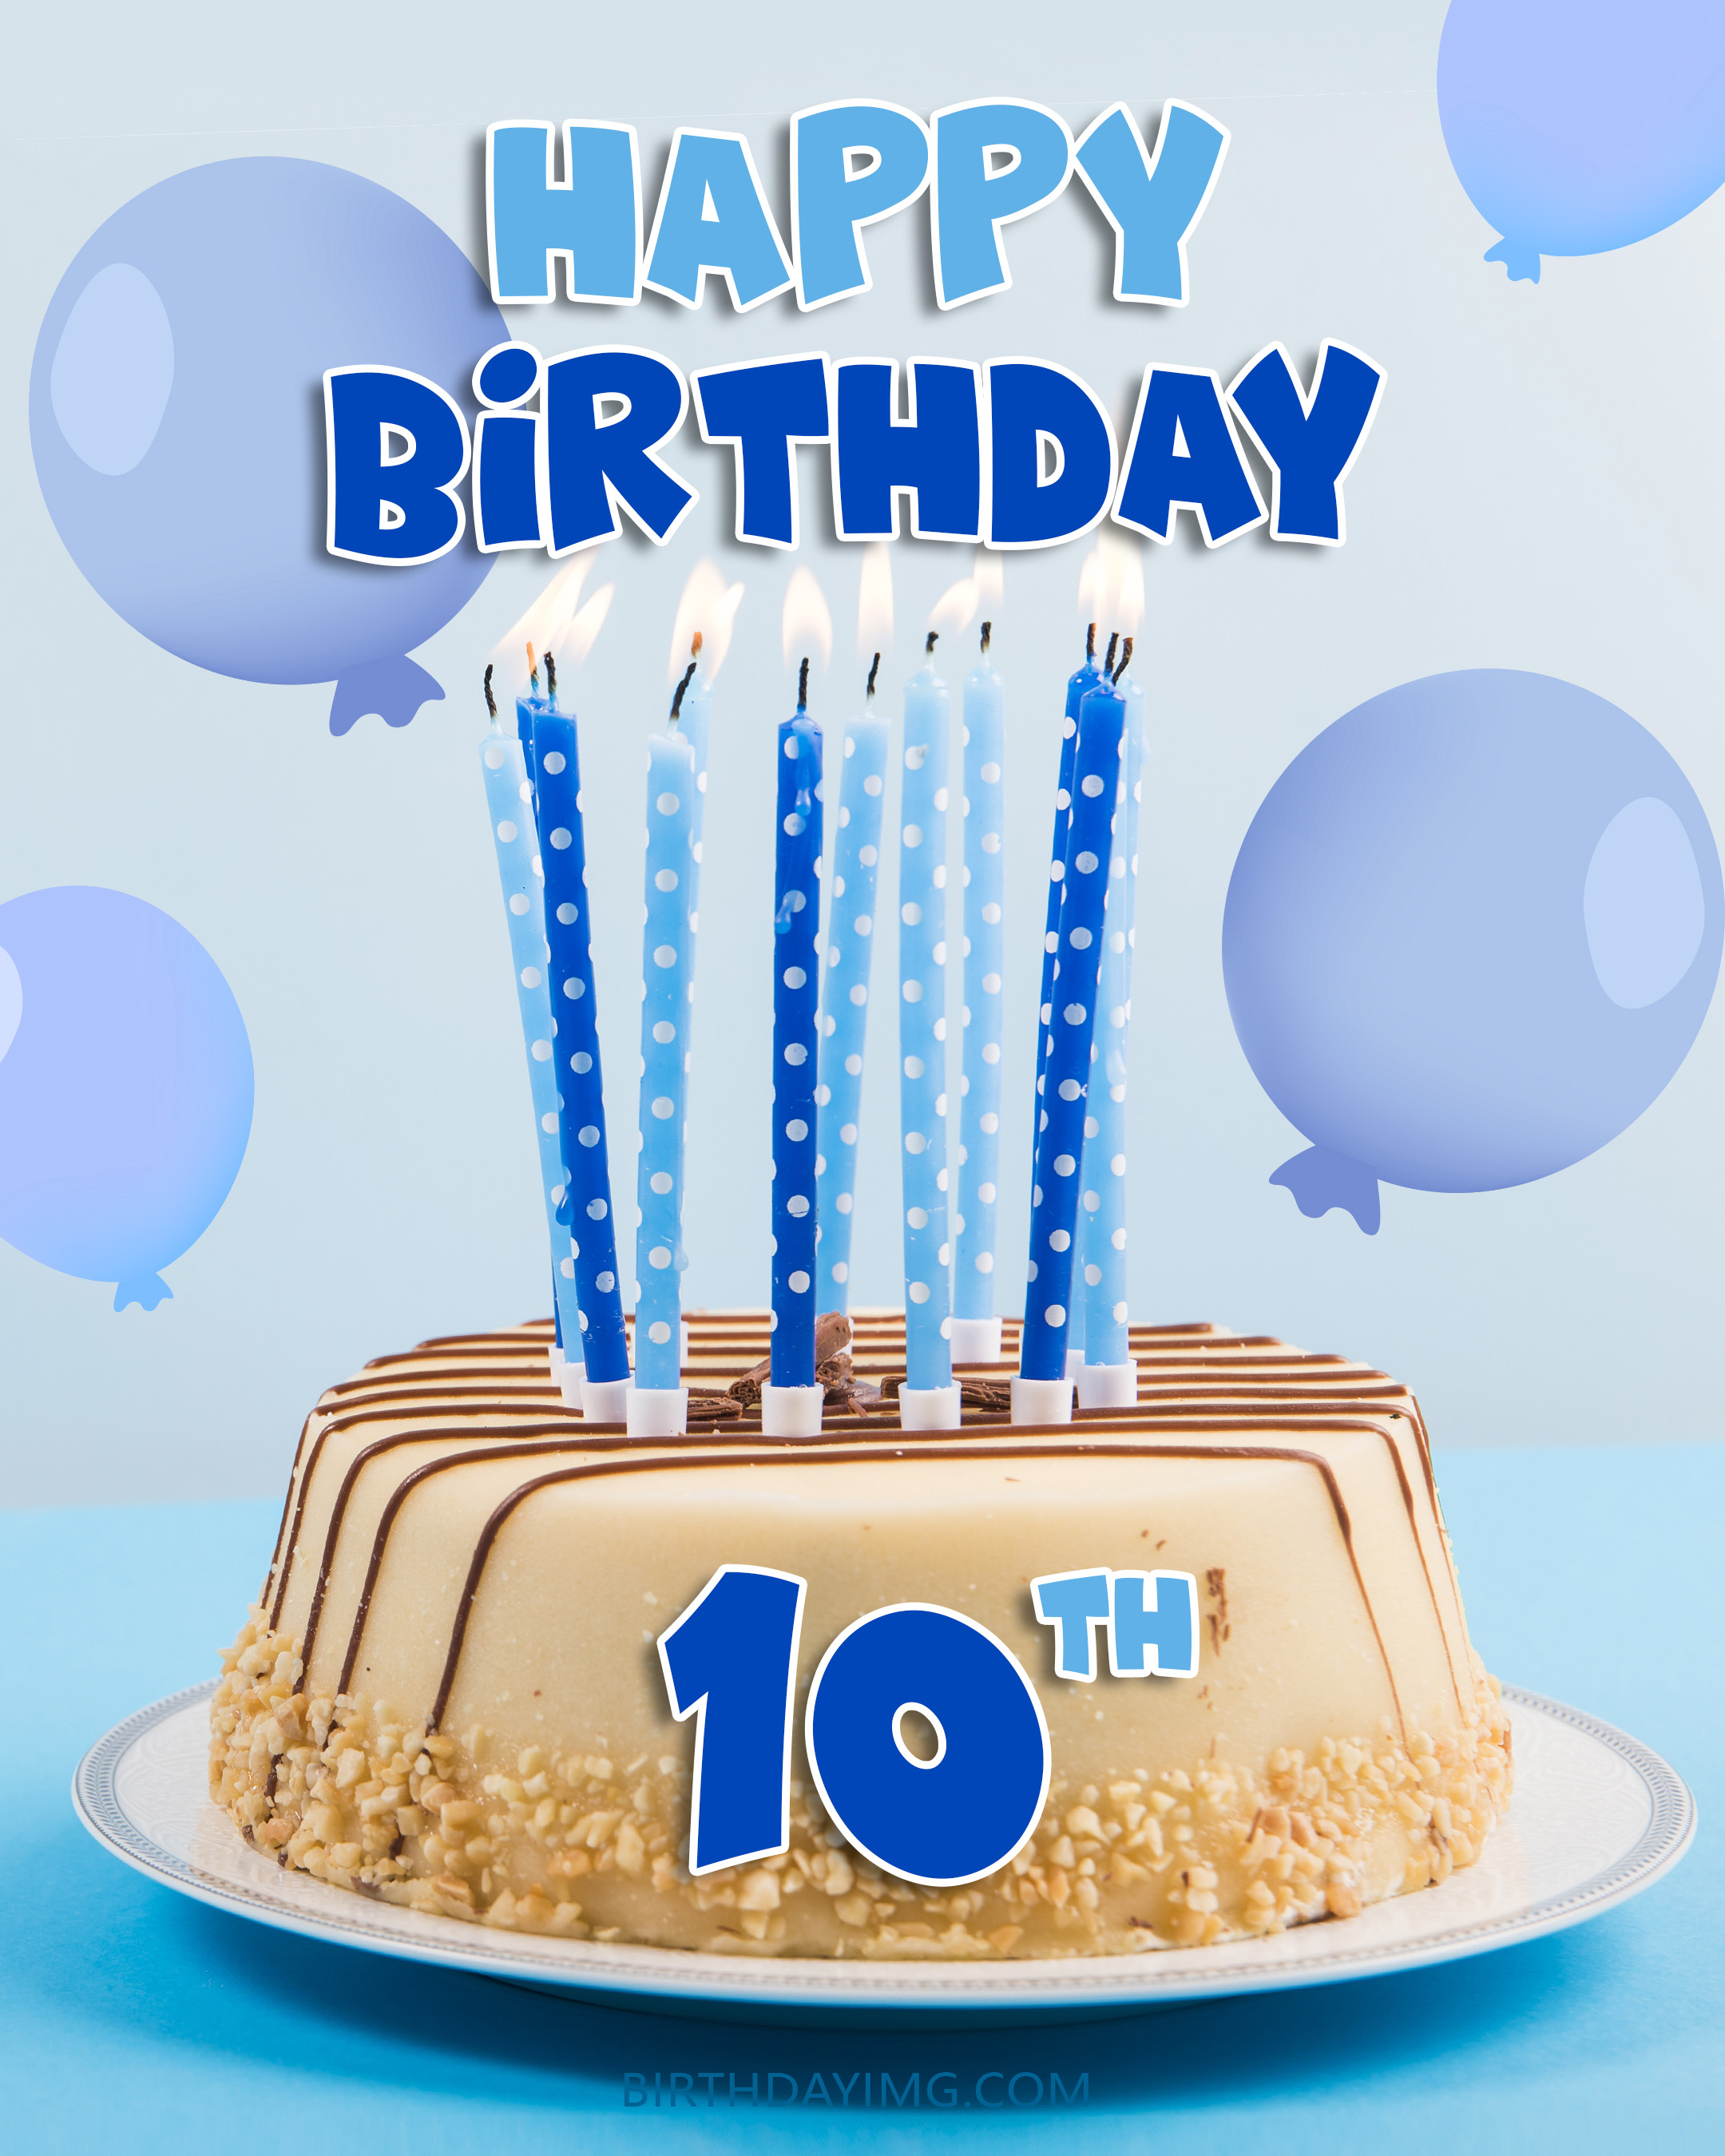 Free 10th Years Happy Birthday Image With Cake And Balloons - birthdayimg.com